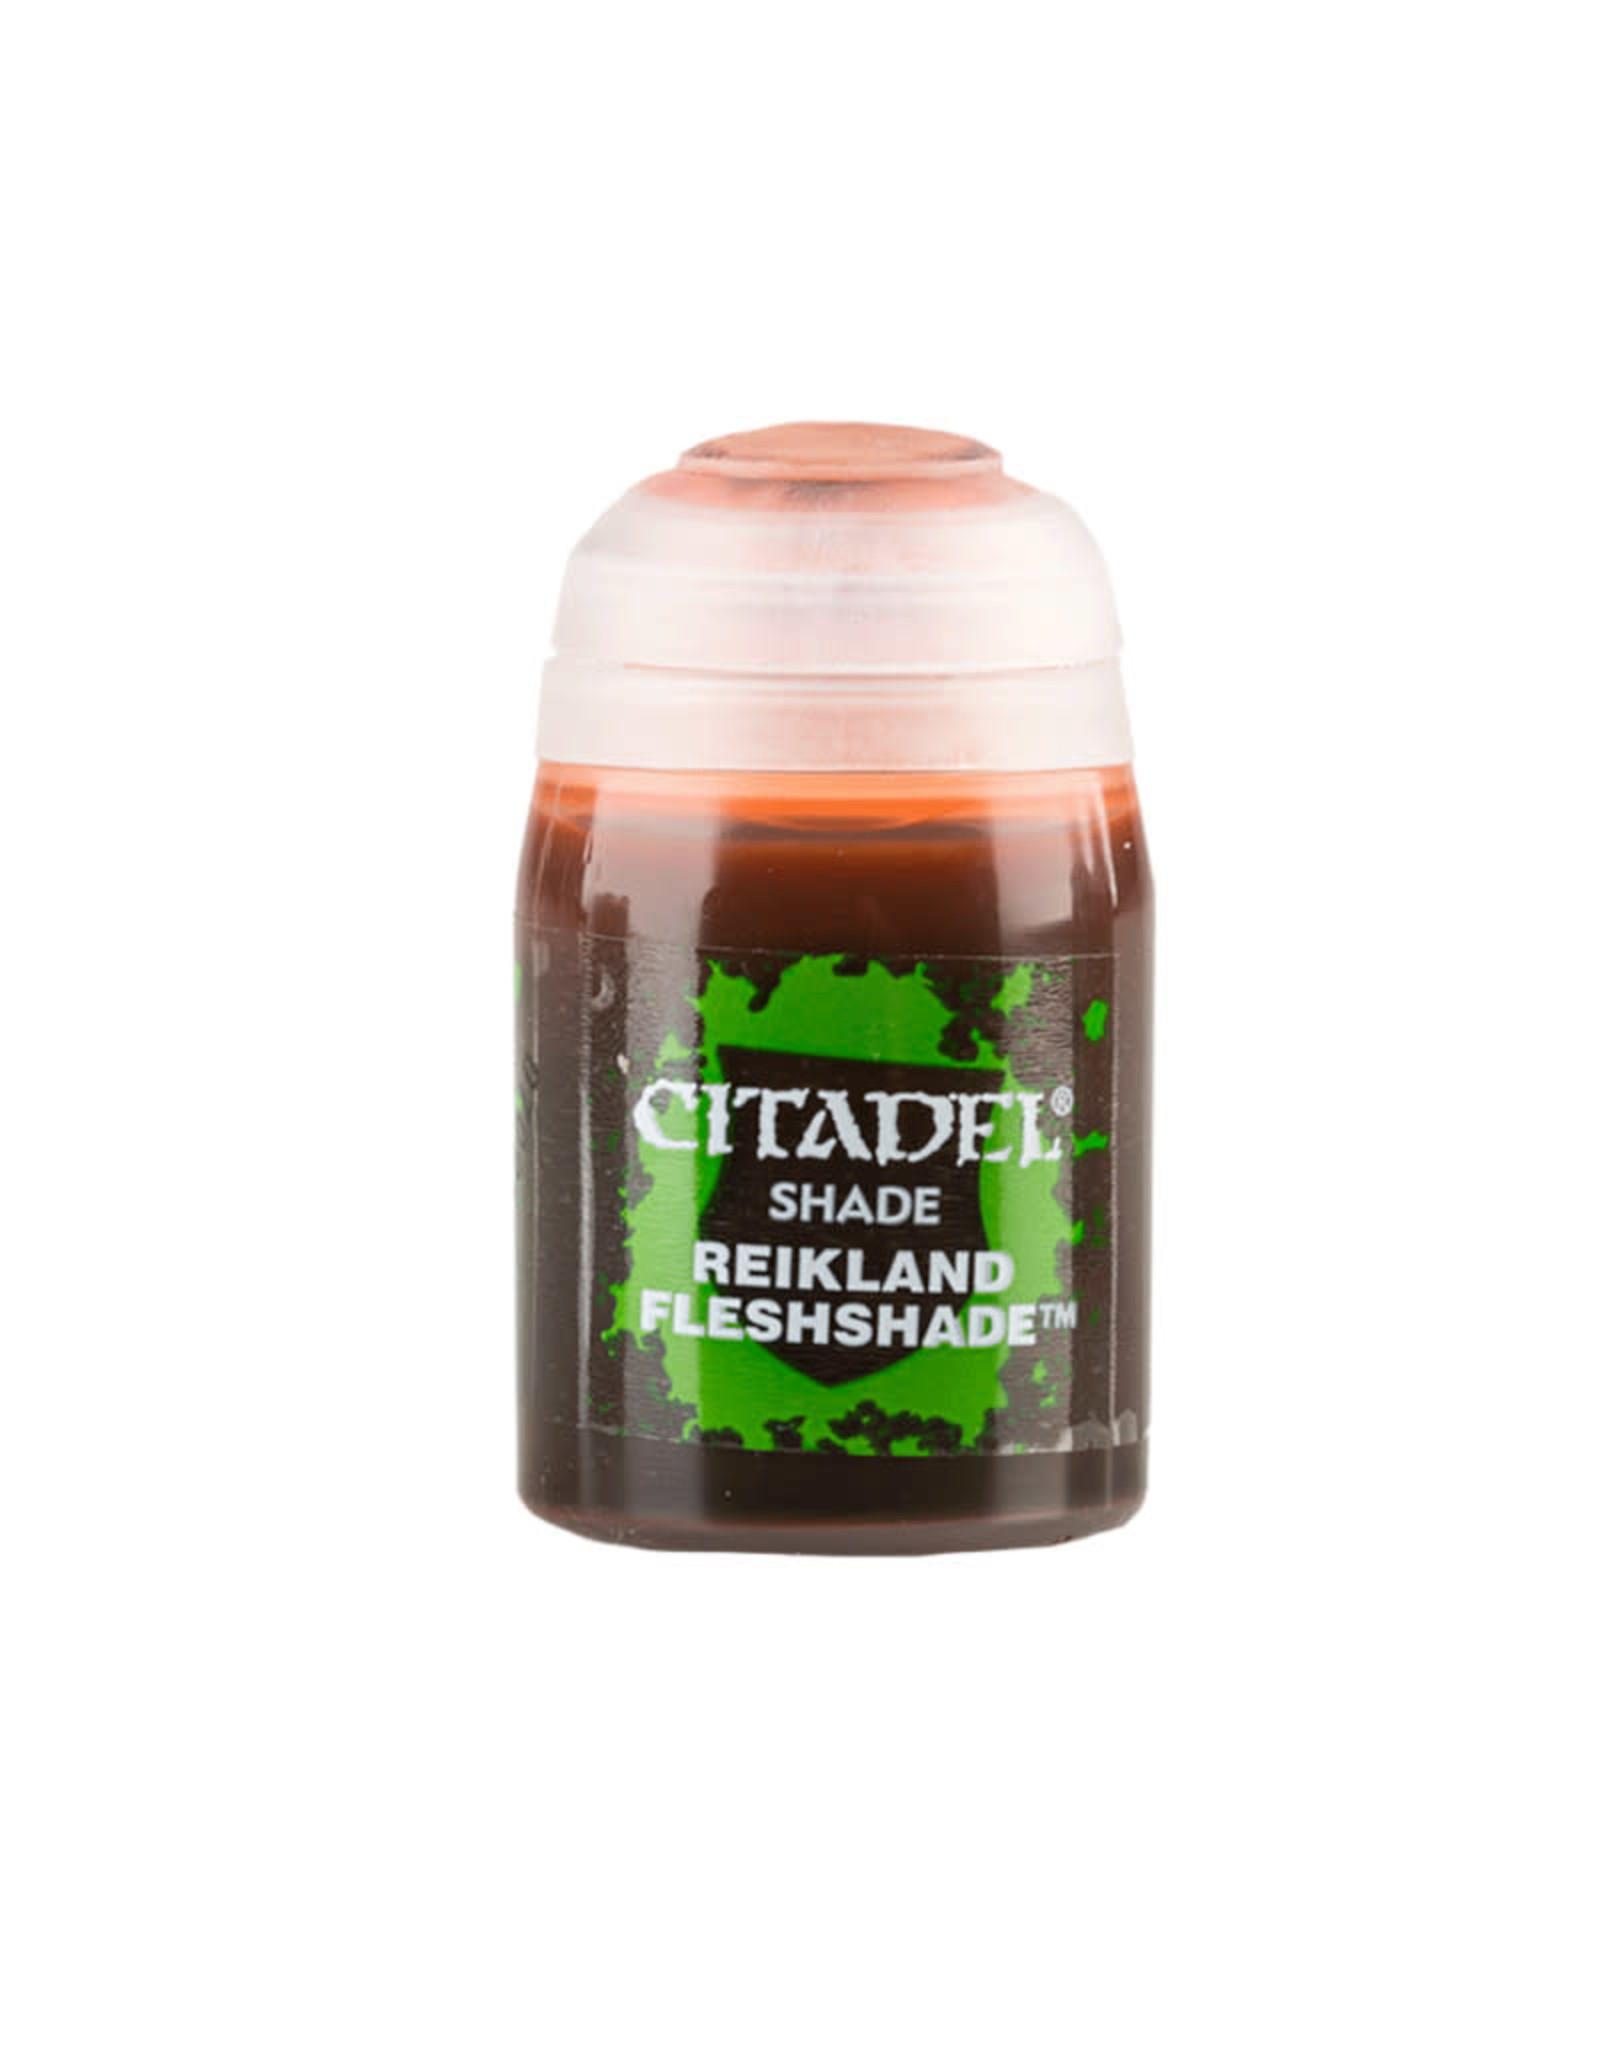 Citadel Shade Paint: Reikland Fleshshade